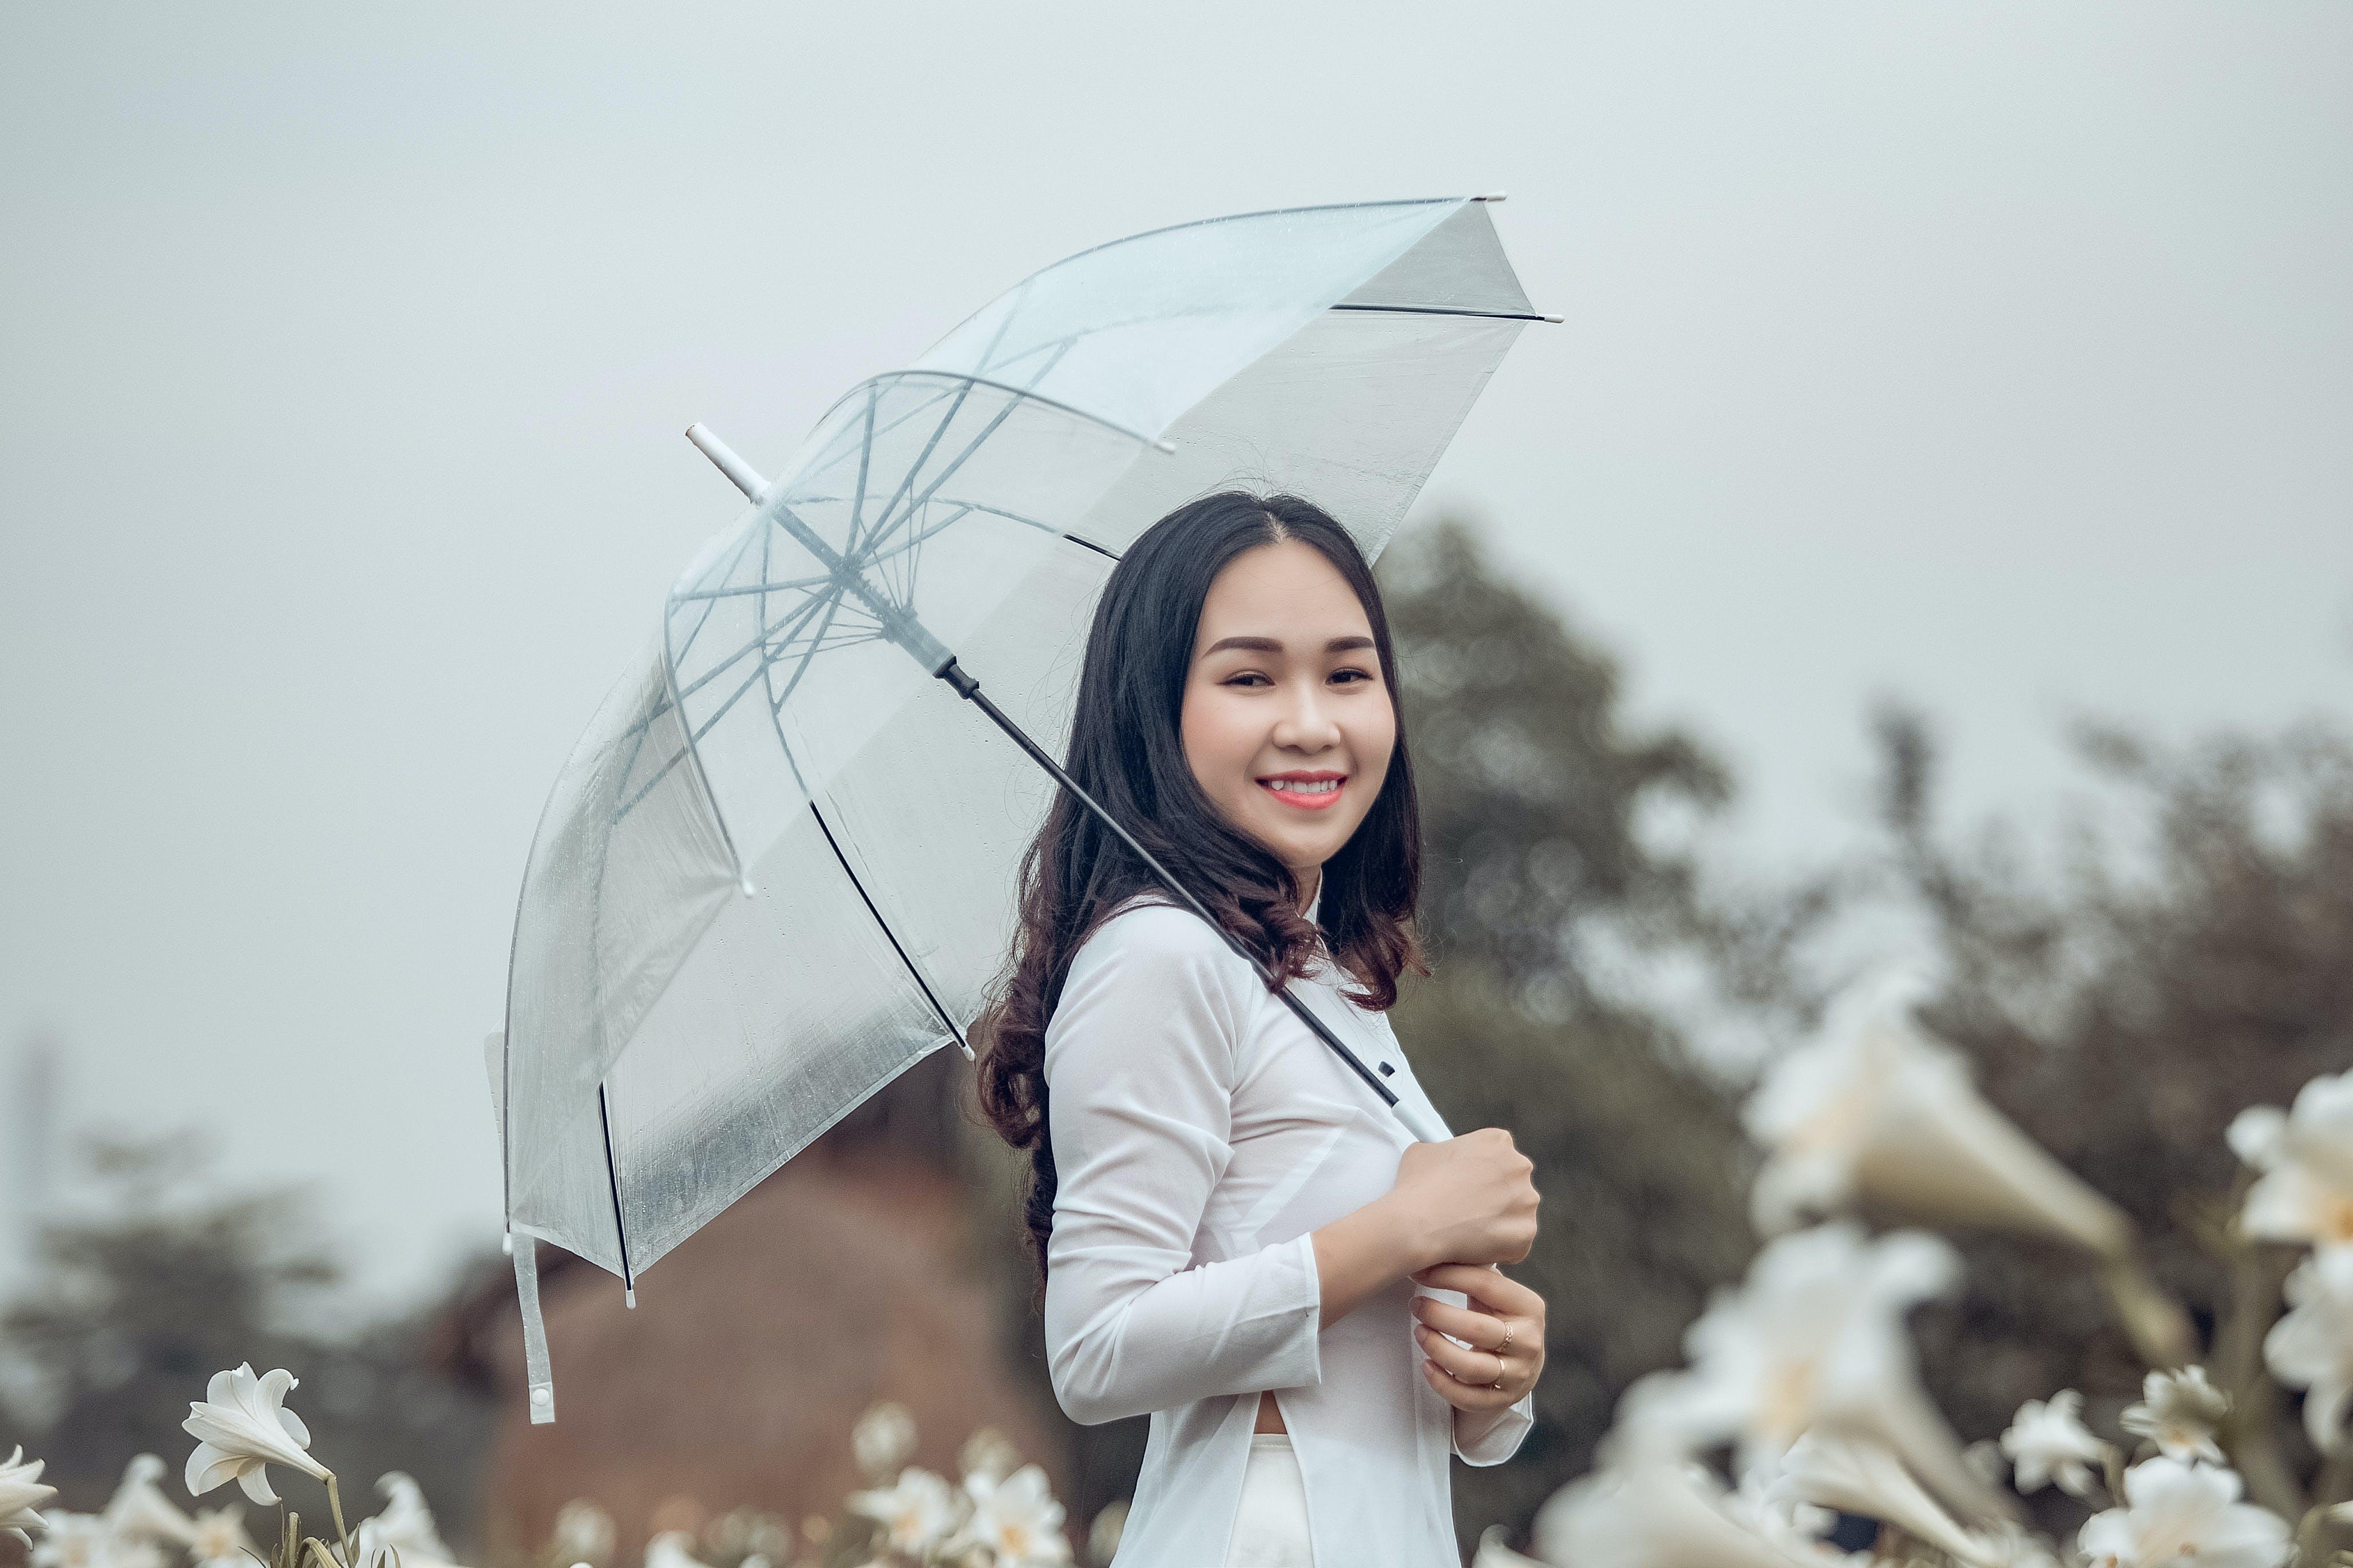 Woman Wearing White Long-sleeved Shirt While Holding Umbrella